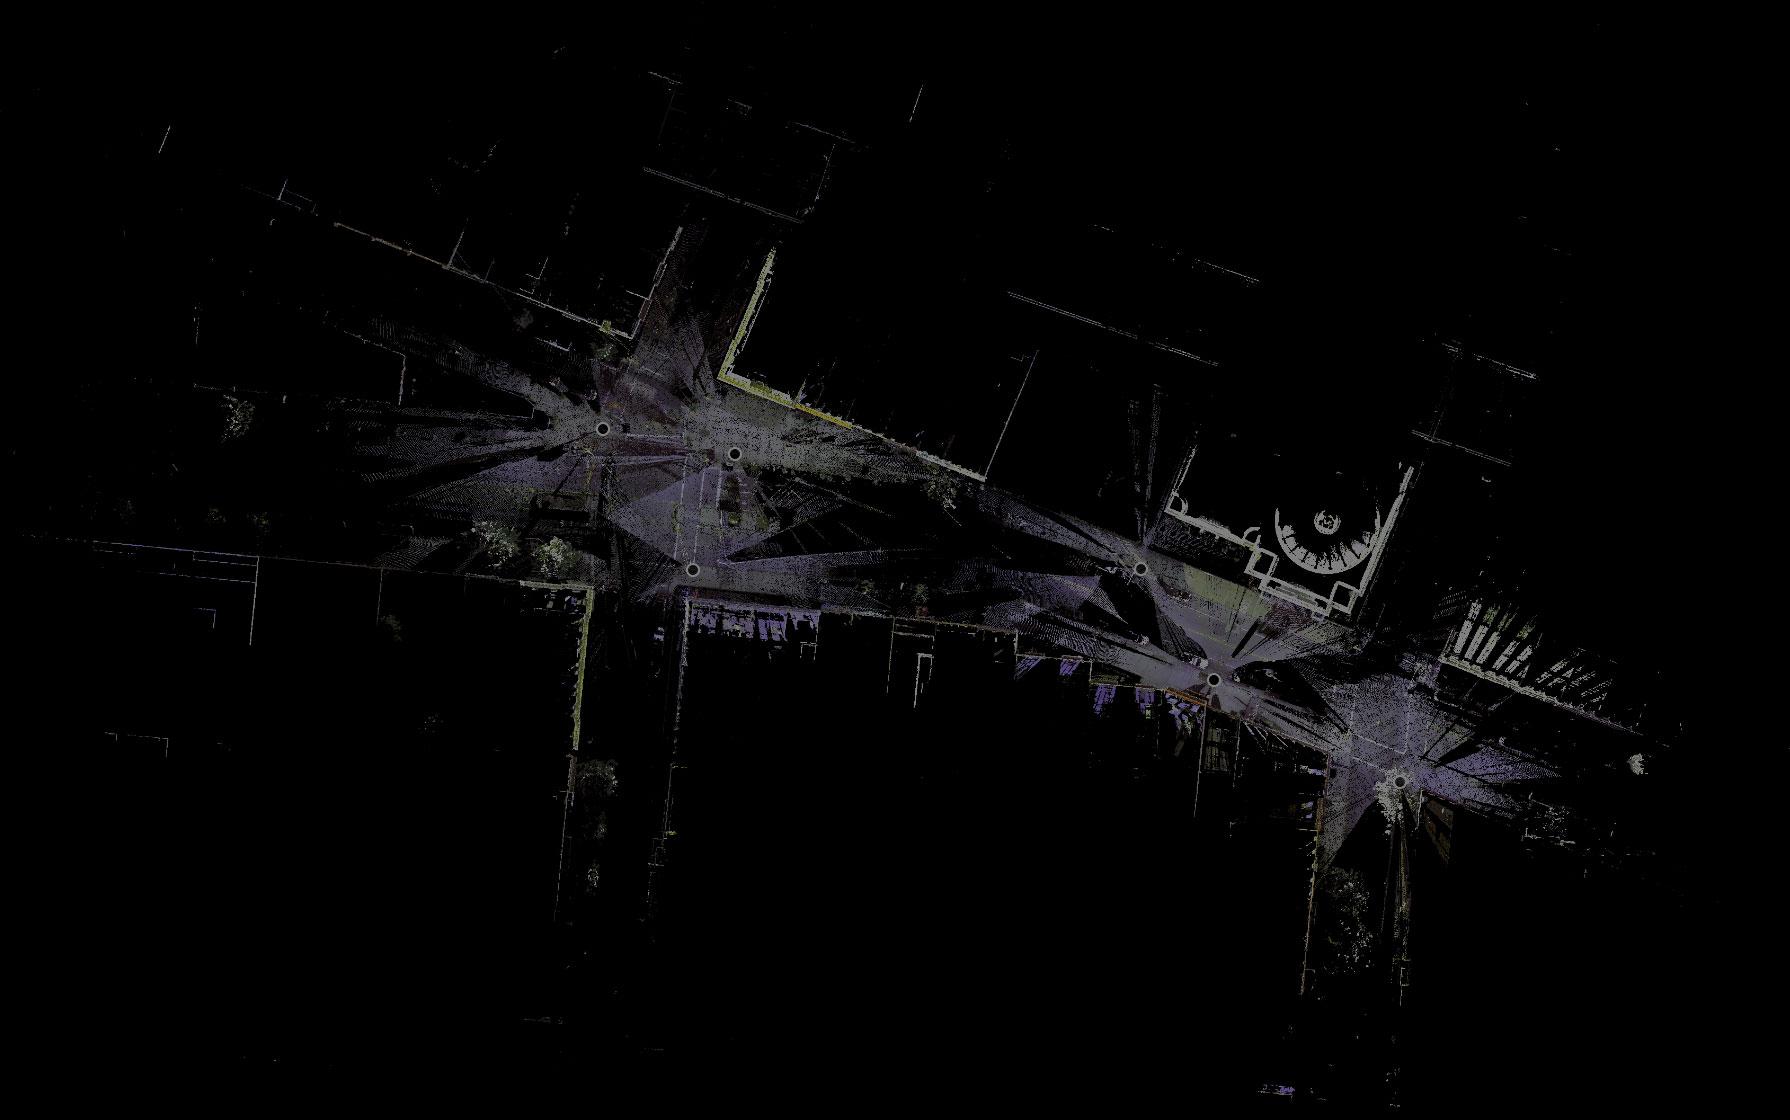 williamsburg-bridge-banks-broadway-Brooklyn-New-York-City-3D-laser-scanning-point-cloud-Mynd-Workshop.jpg